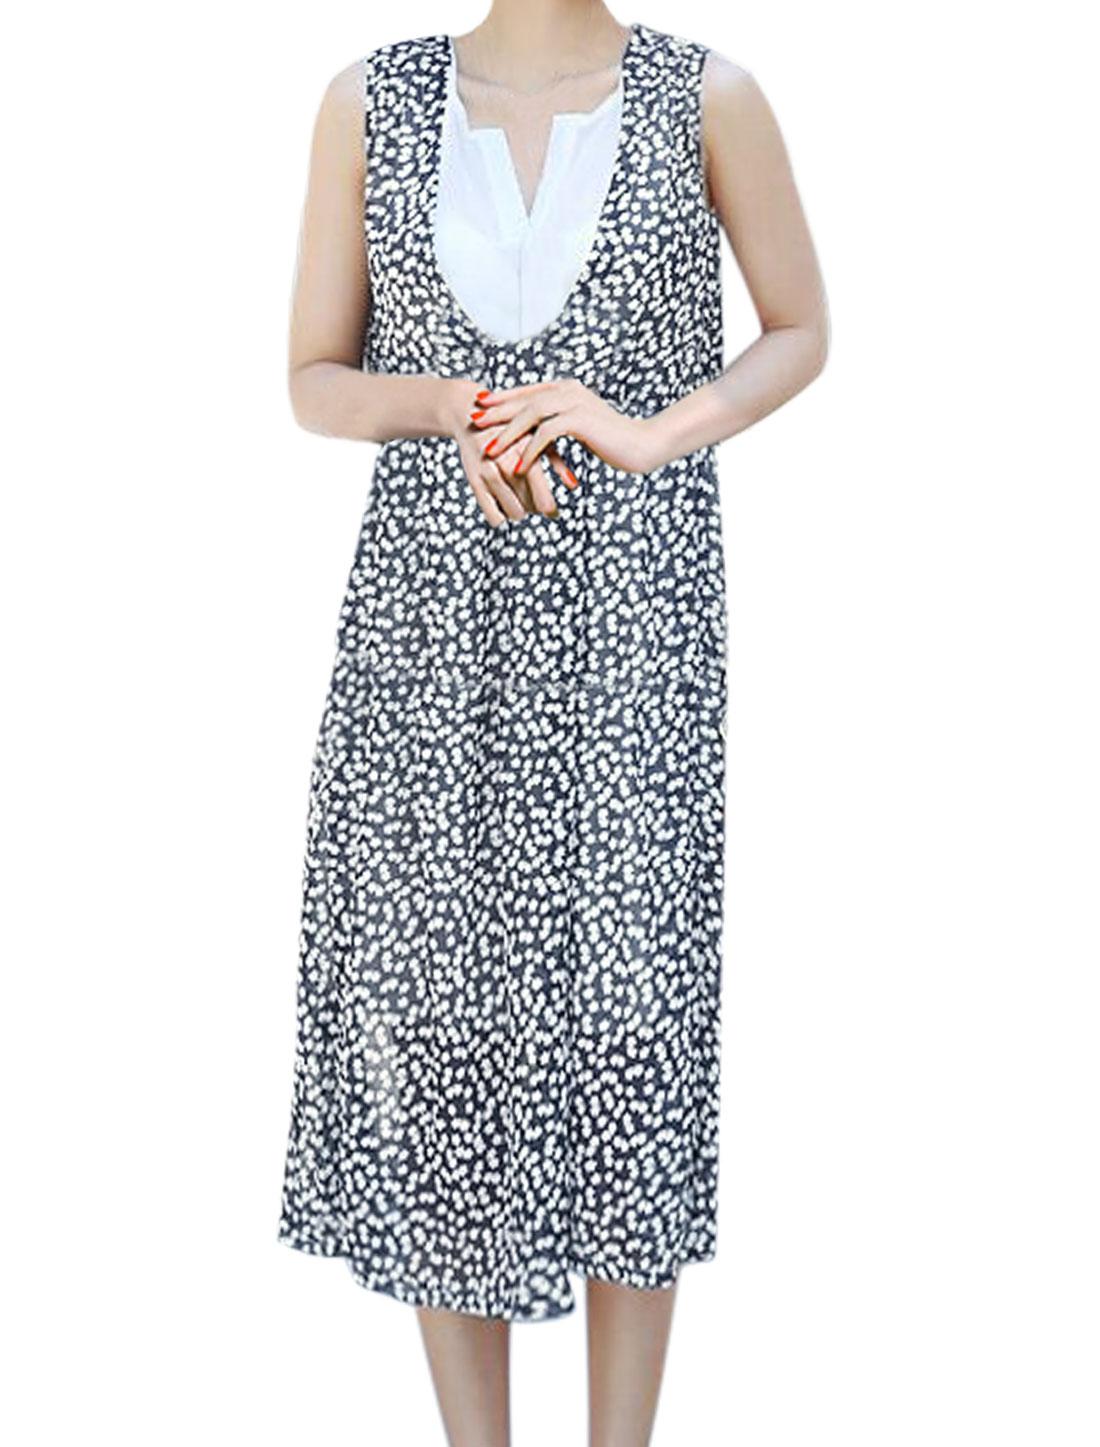 Women Split Neck Sleeveless Floral Print Layered Chiffon Dress Black M